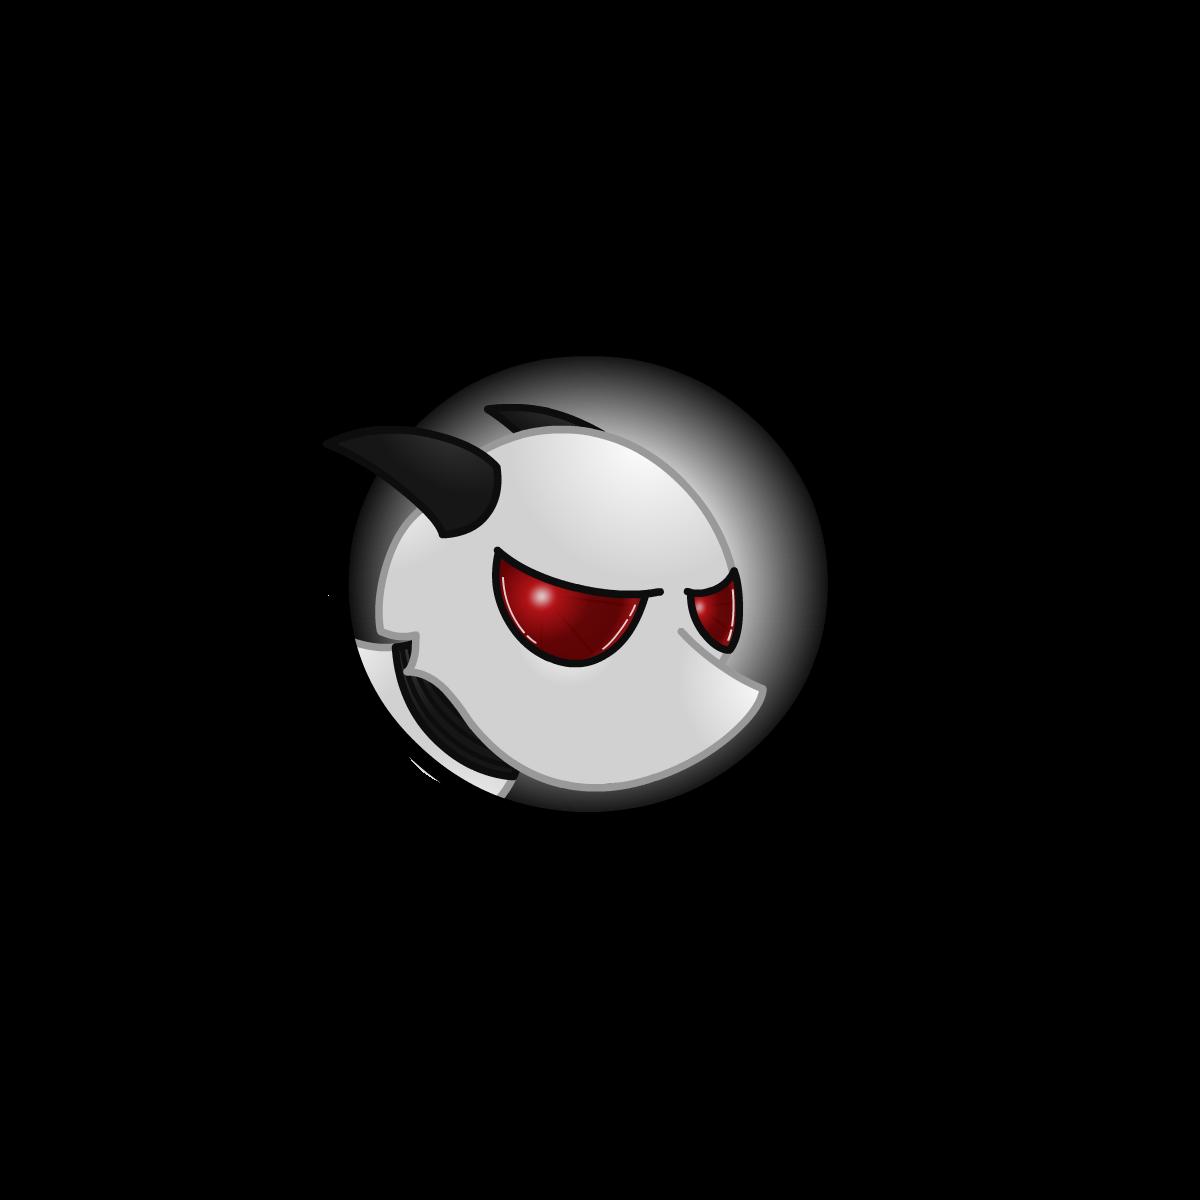 Crank Icon by Lakword